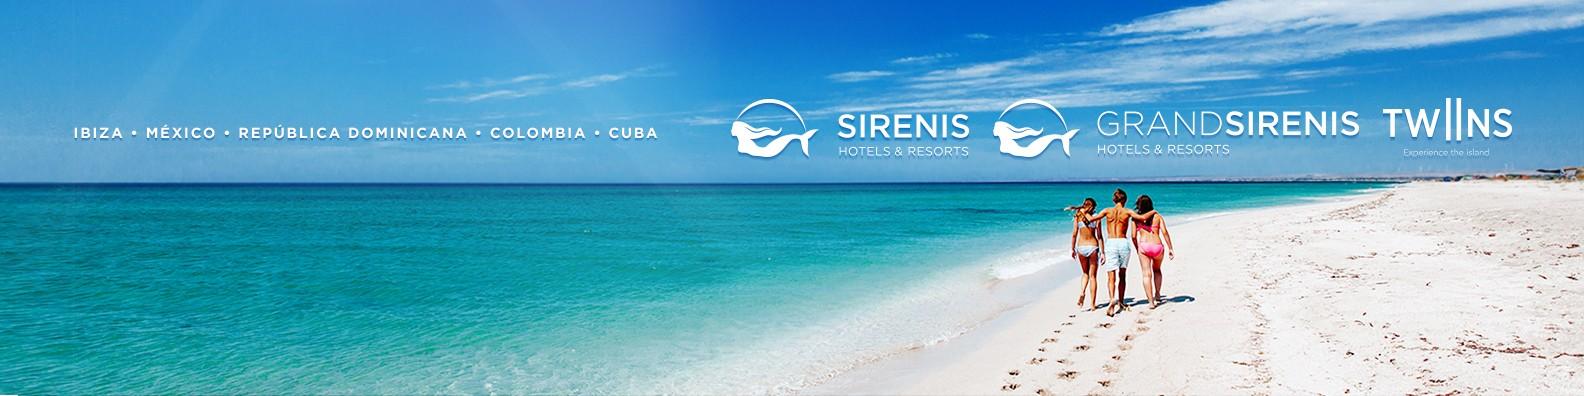 Sirenis Hotels Amp Resorts Linkedin